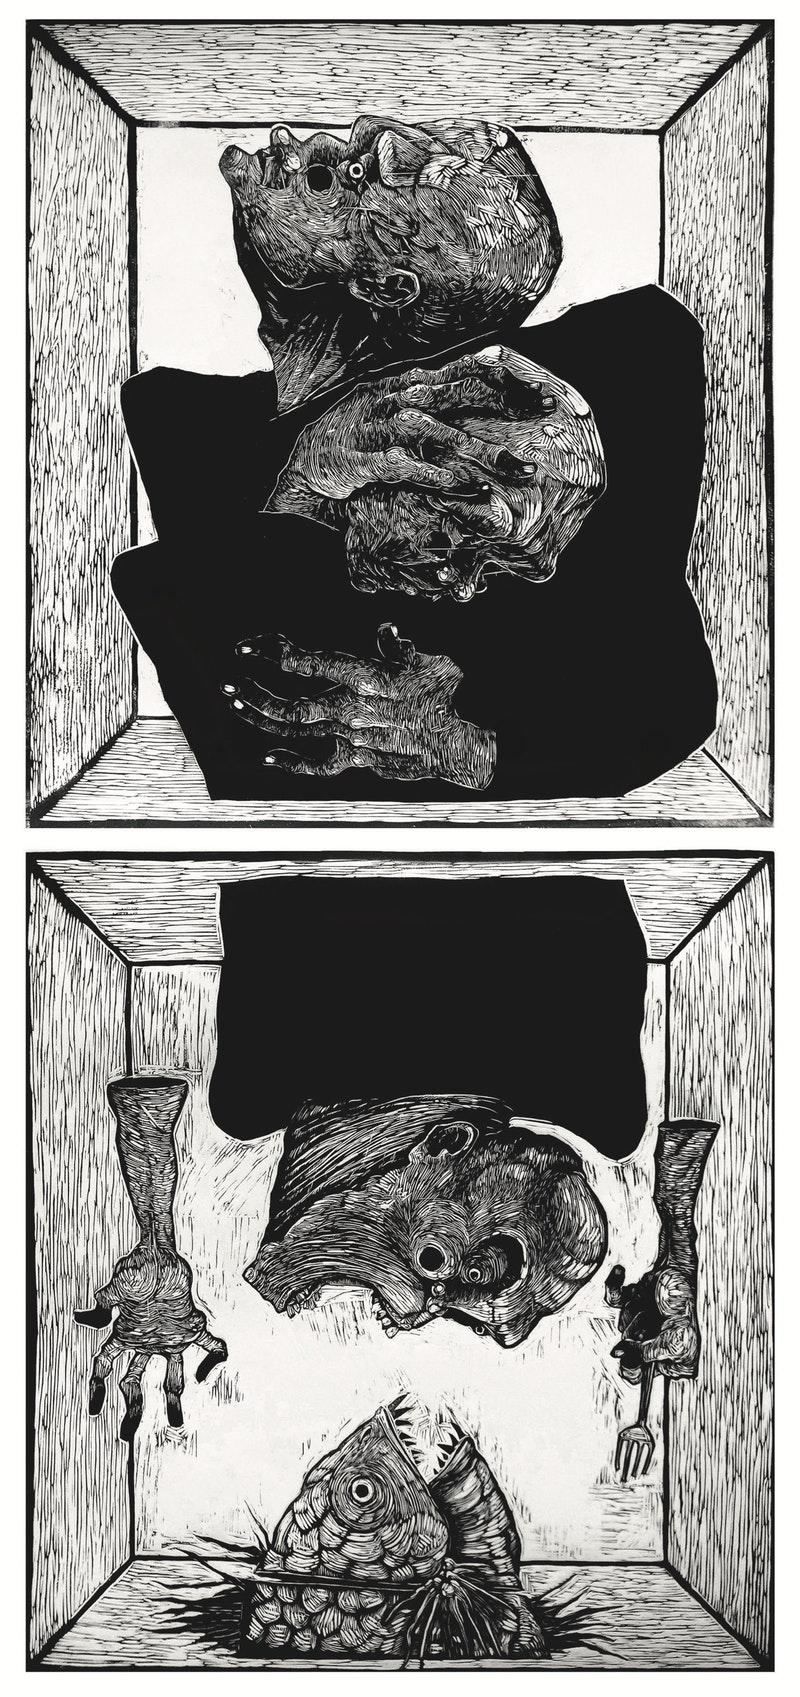 Rizal Pramana , 'Embrace#6 (Imminent Danger)', Linocut on Paper, 58 x 60 cm